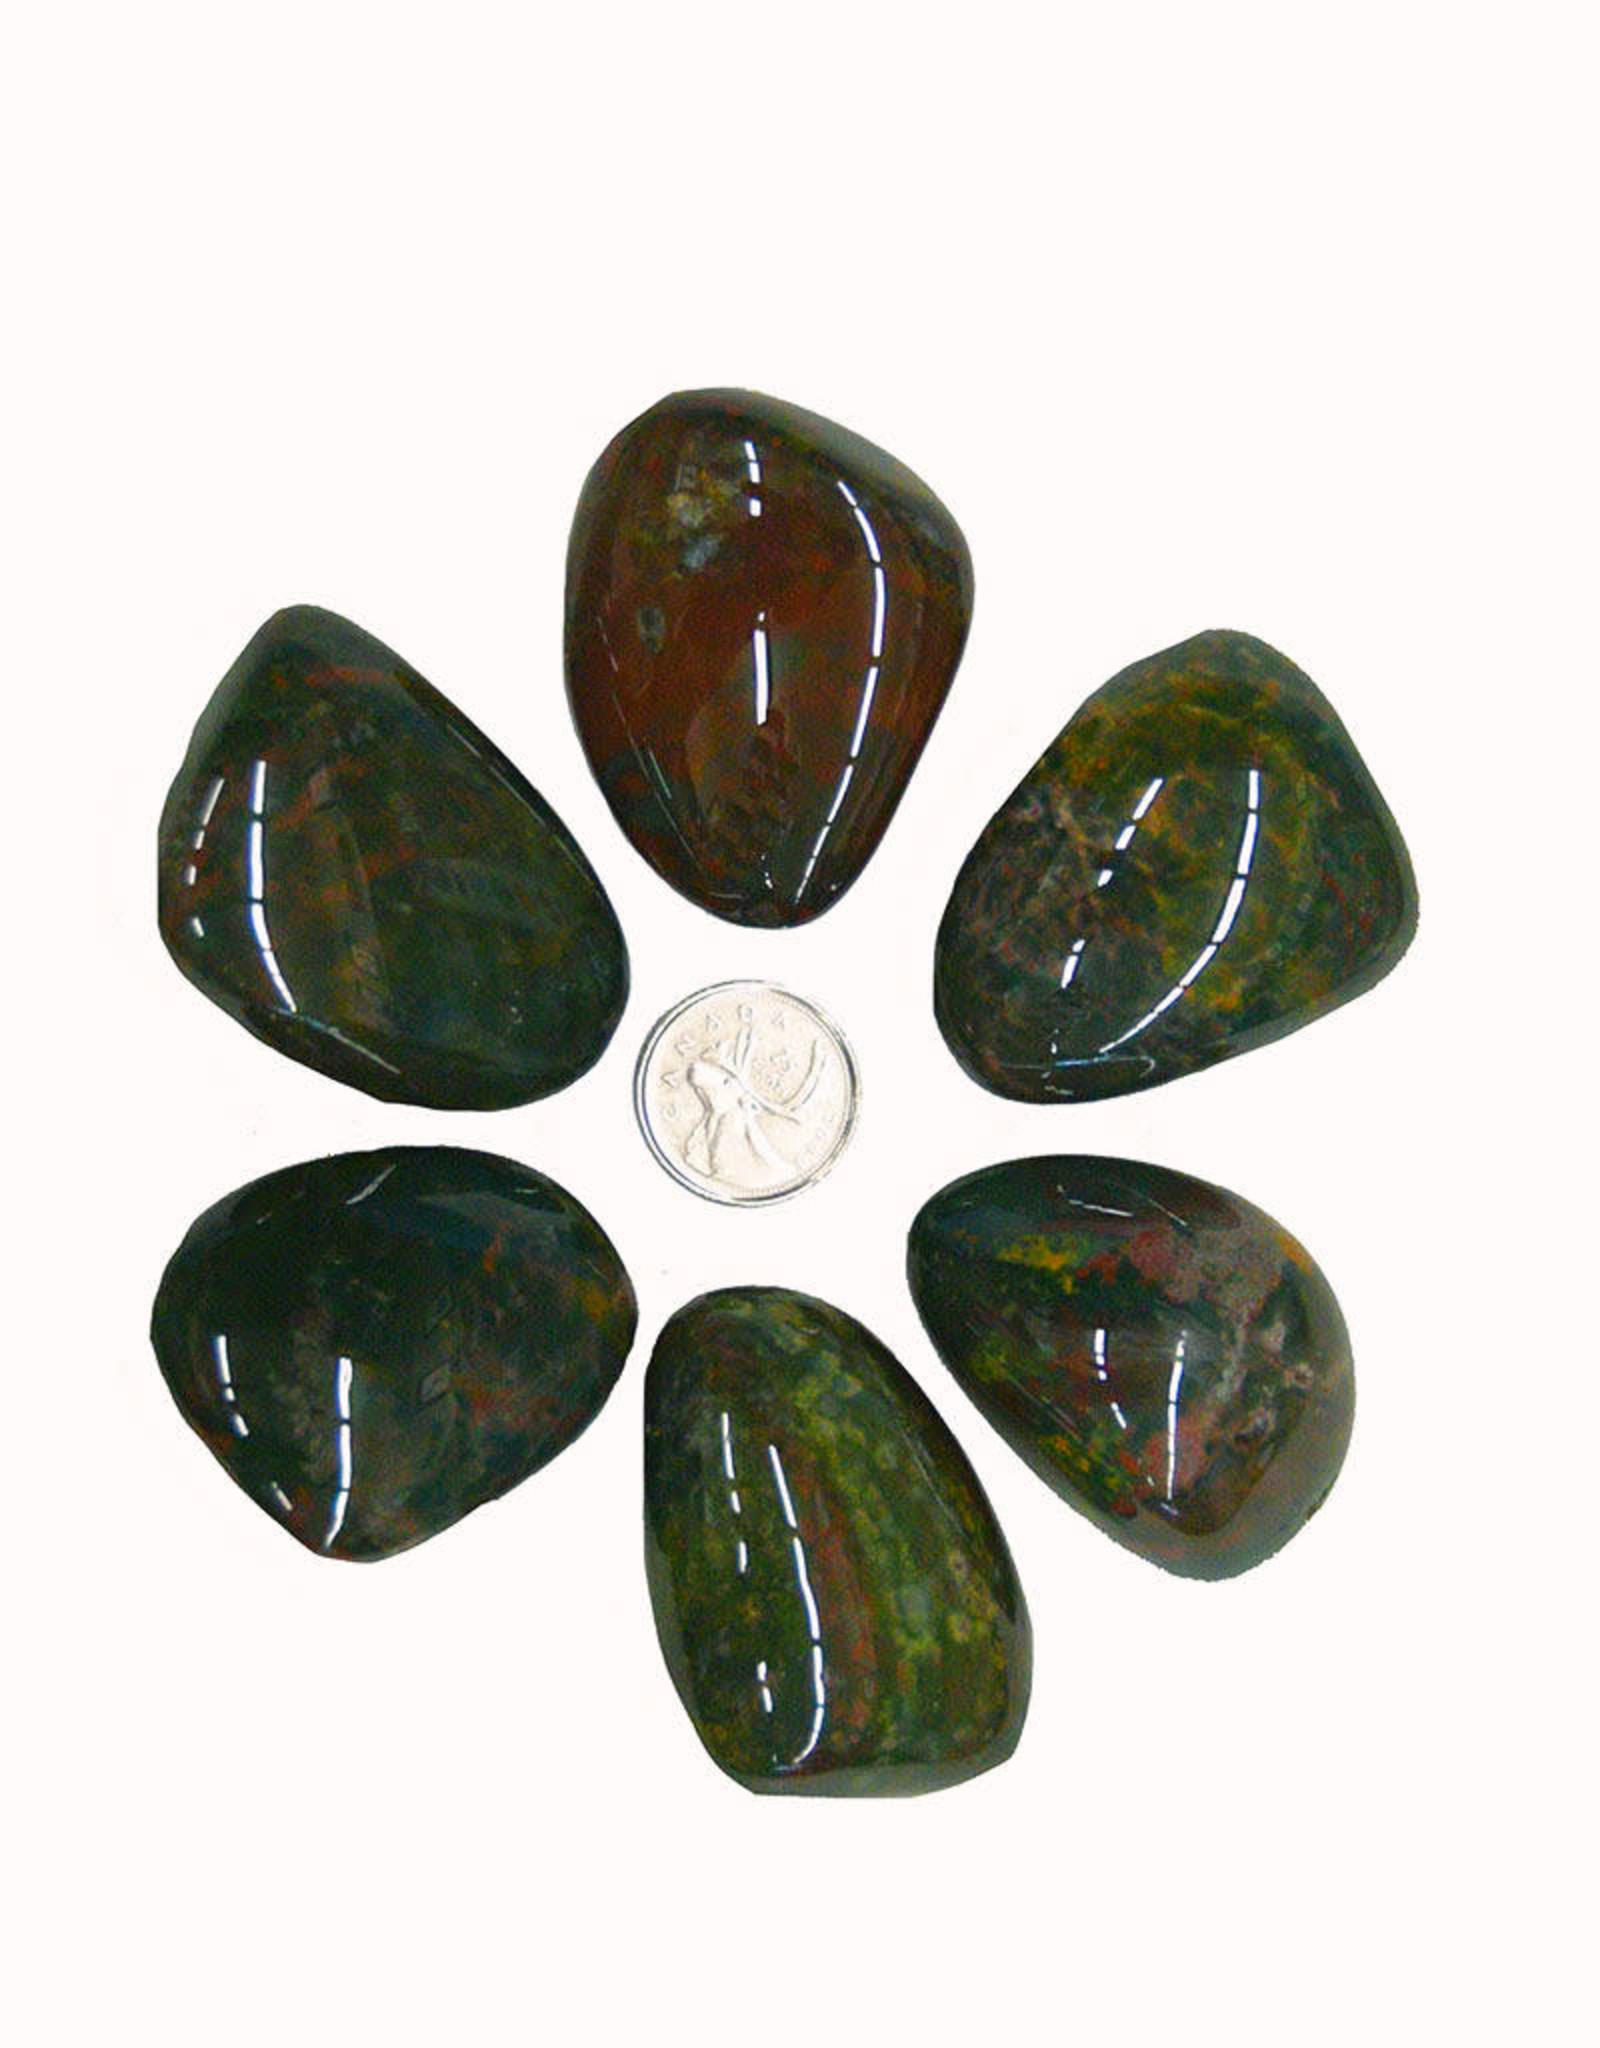 Bloodstone Palm Stone $12